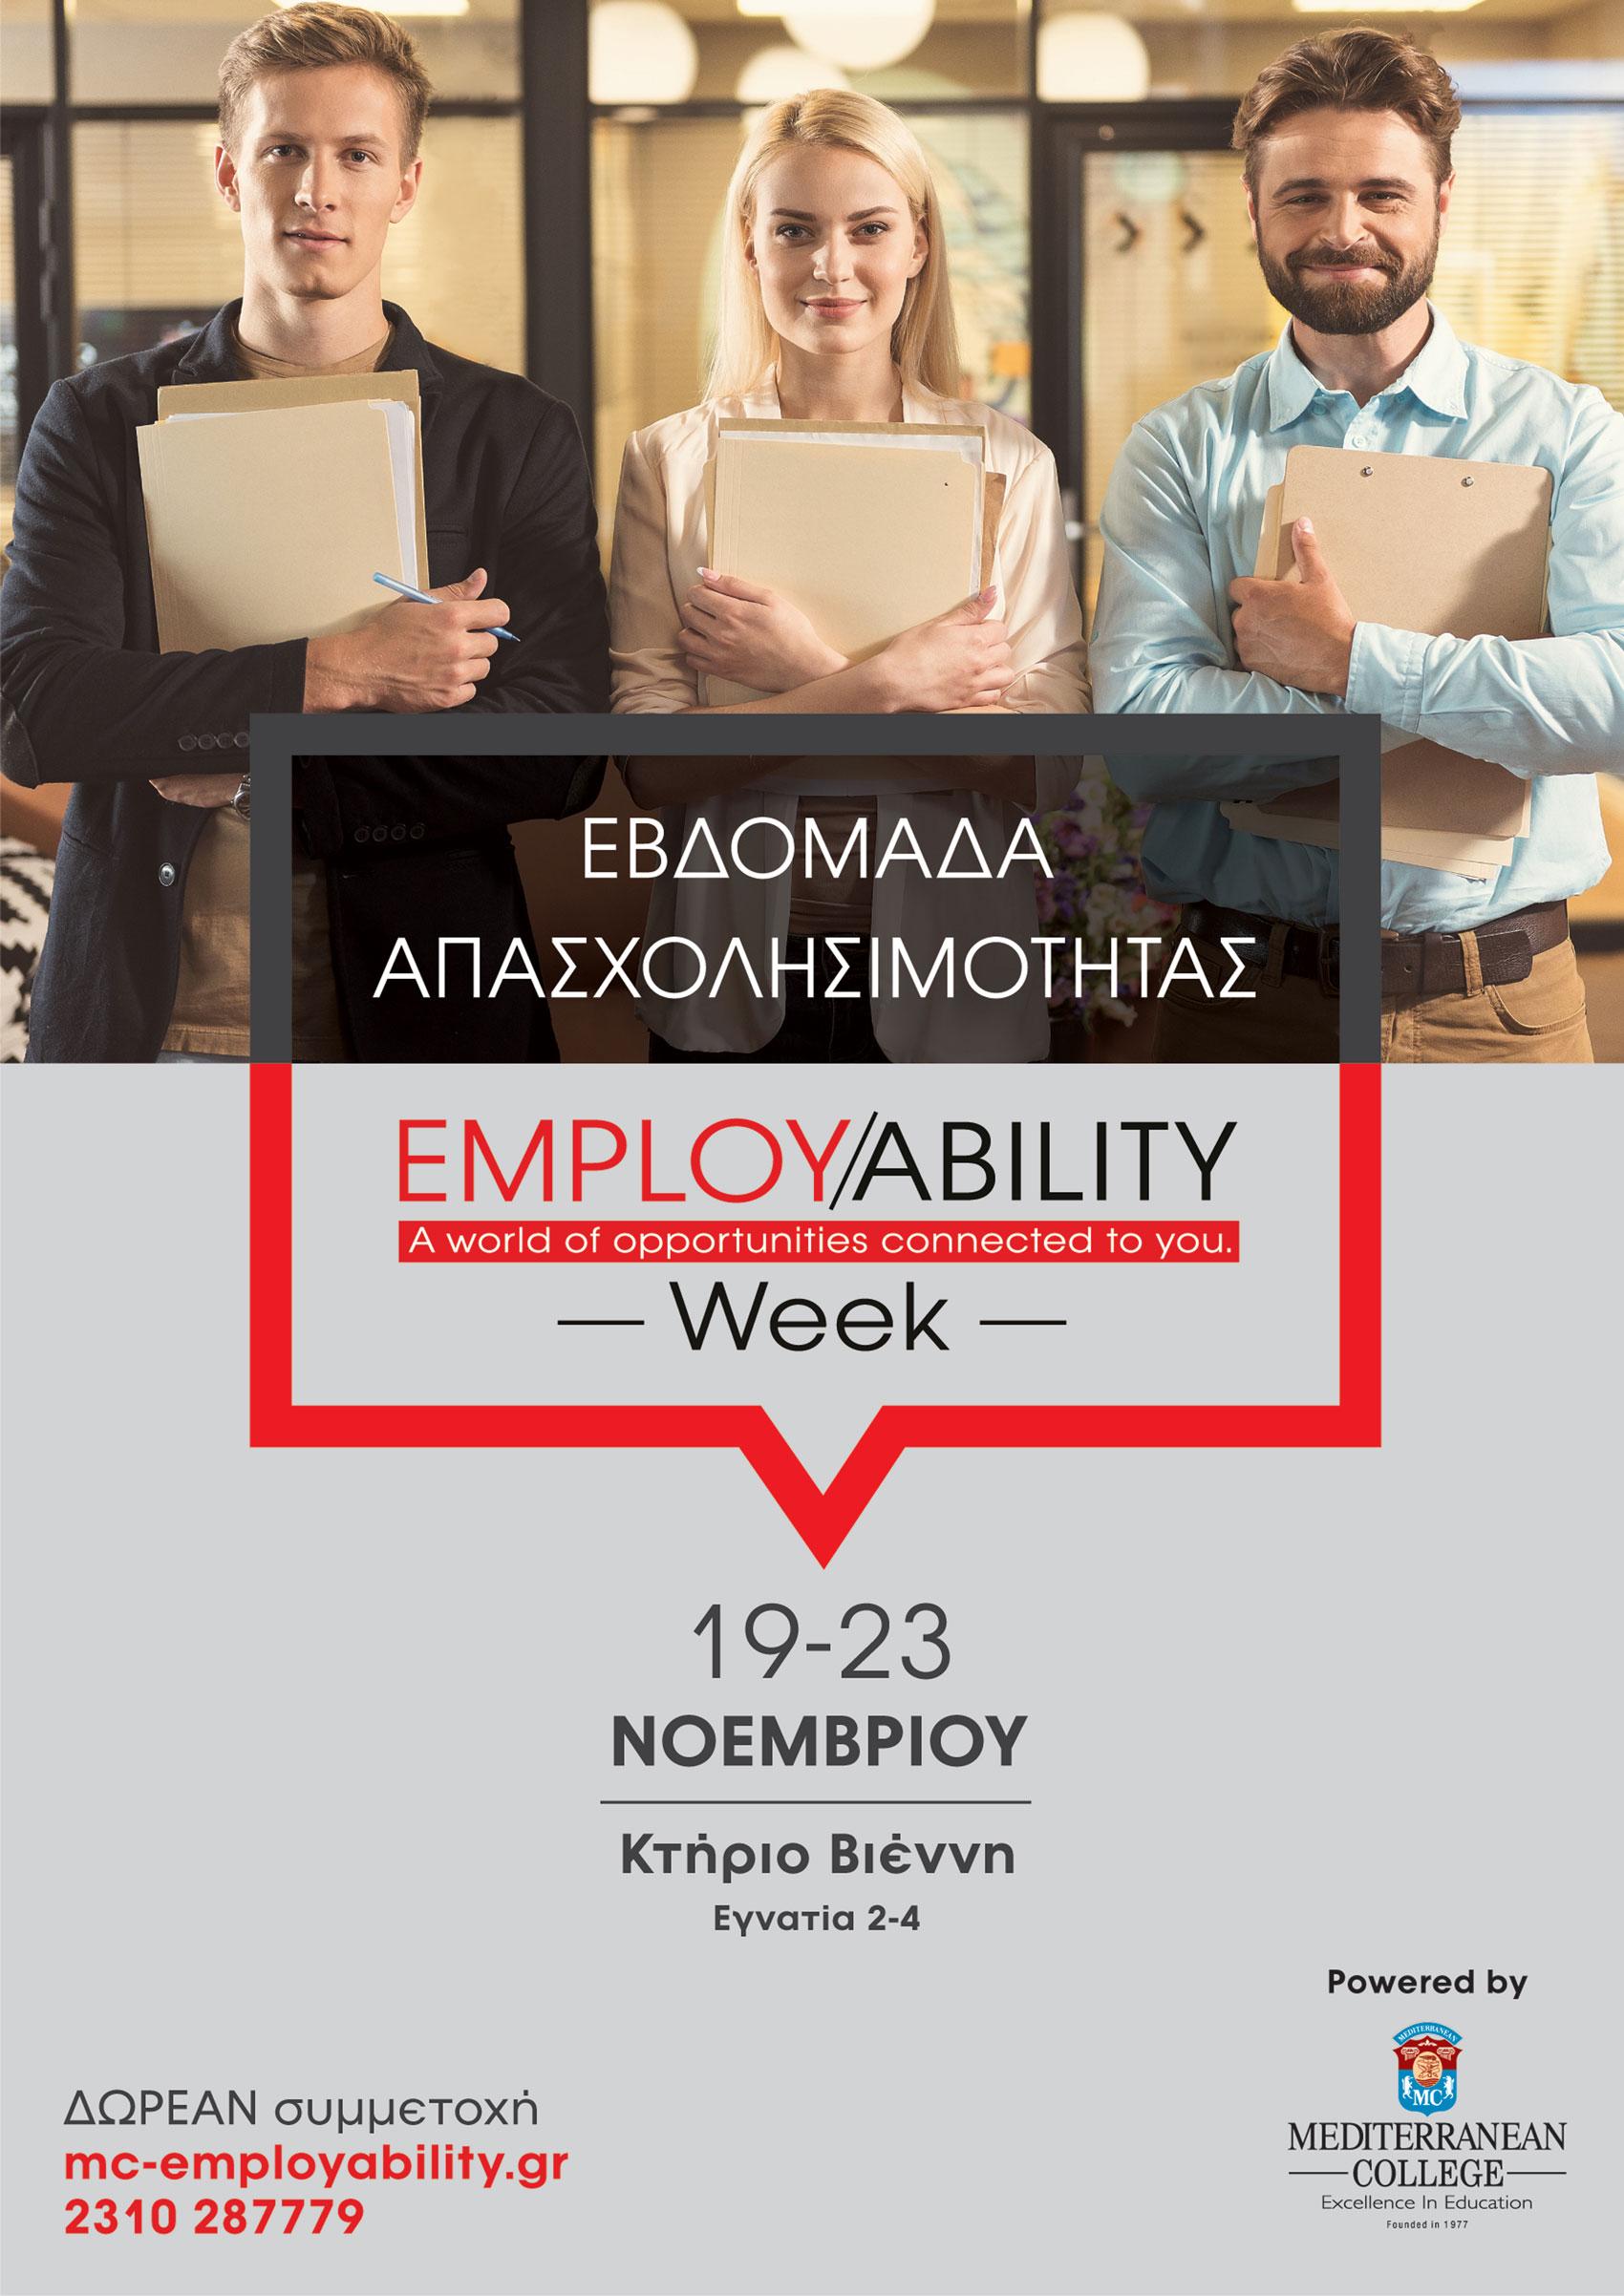 Mediterranean College Θεσσαλονίκης-Η ενίσχυση της απασχολησιμότητας στο επίκεντρο